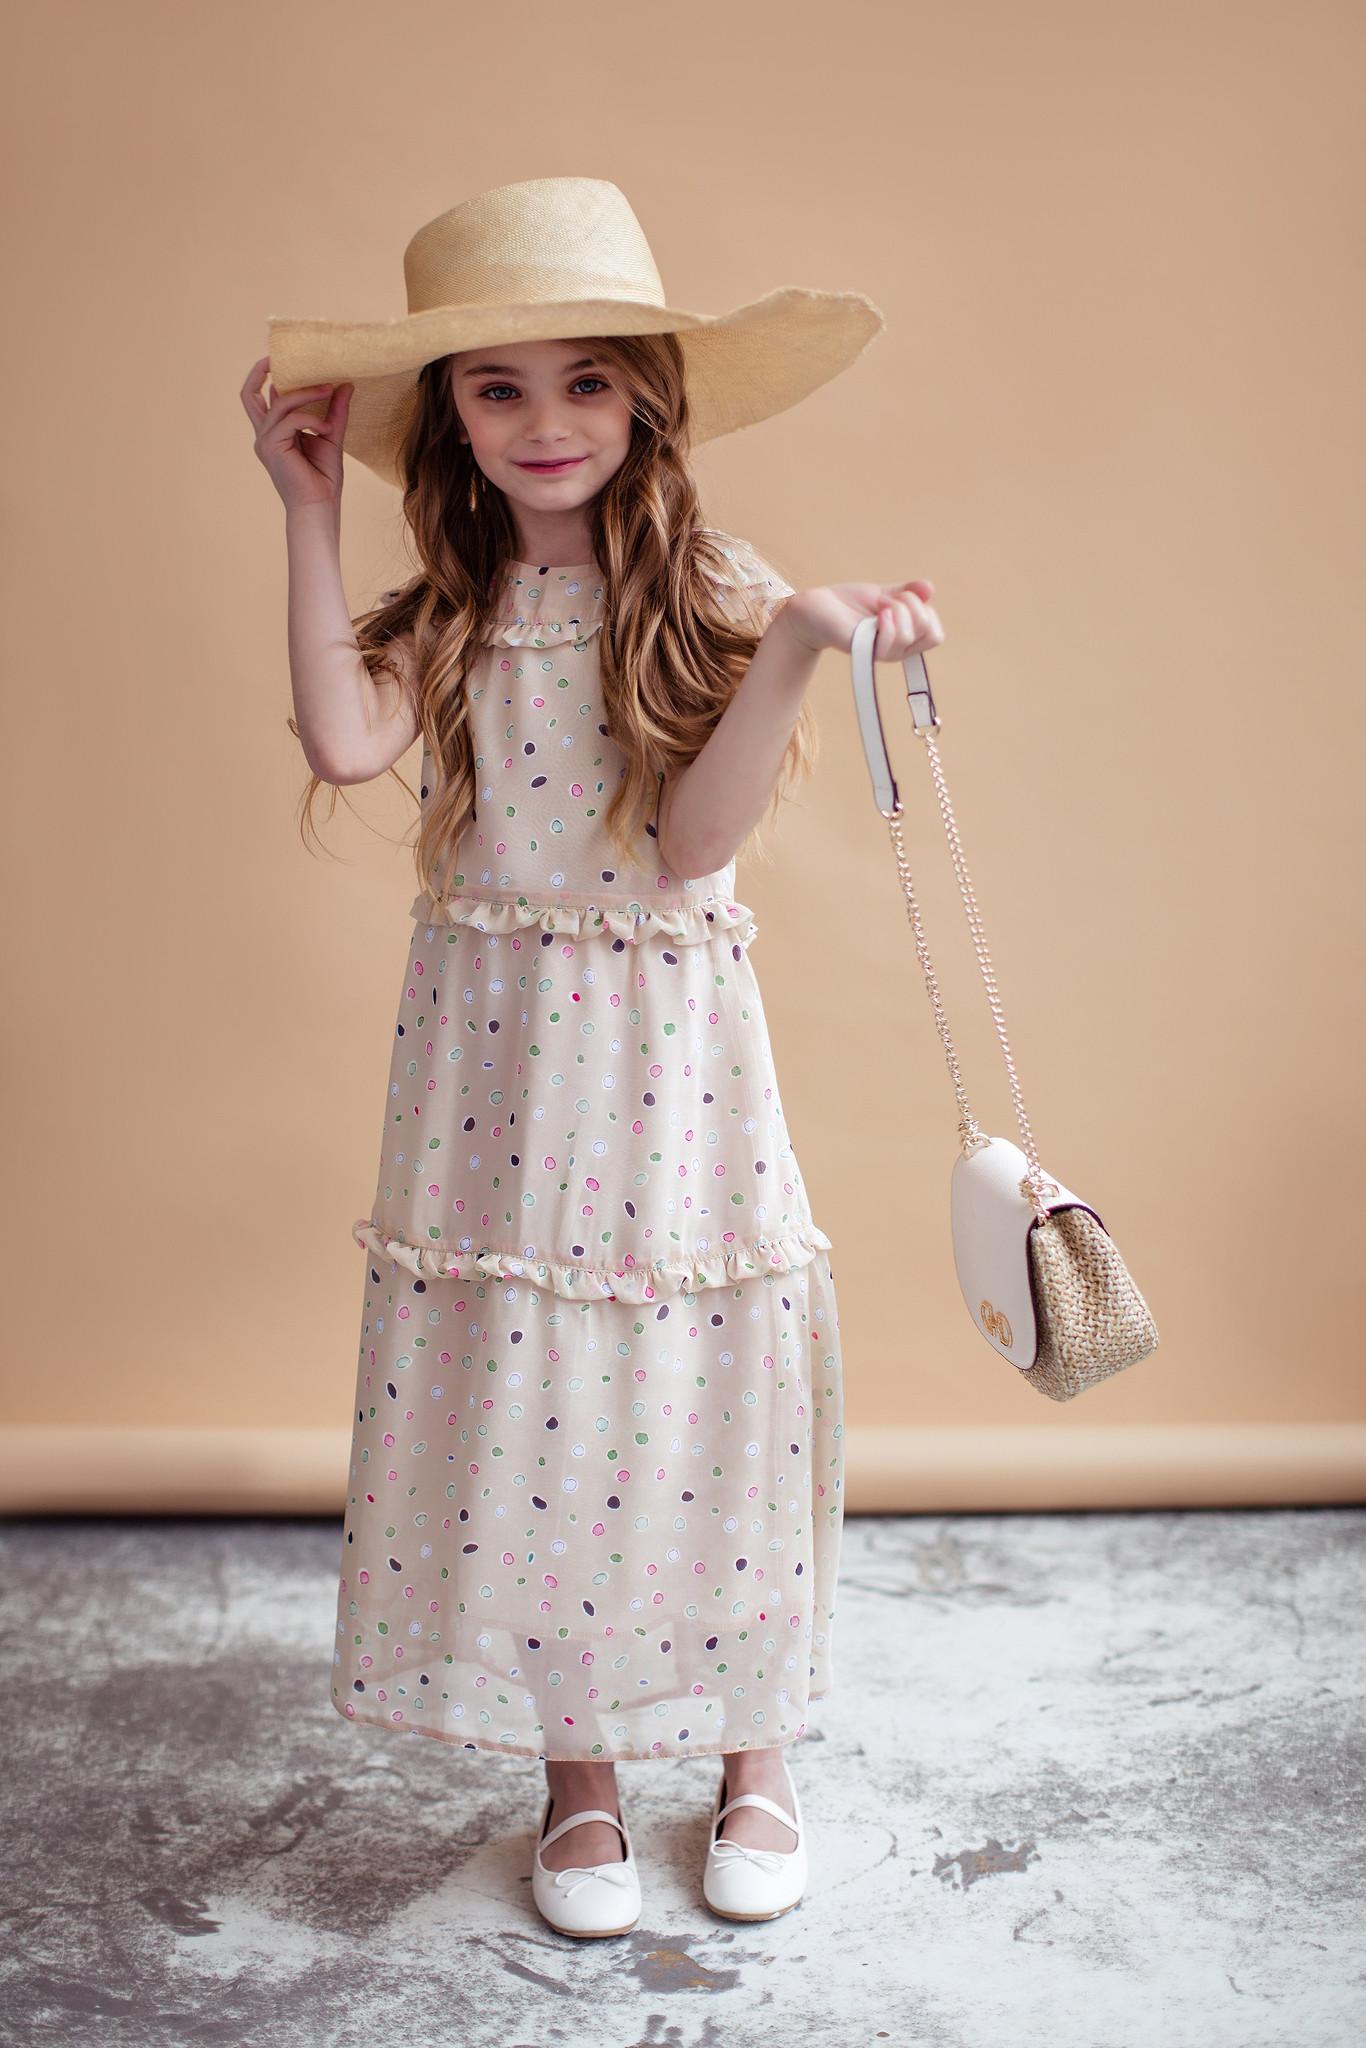 Sukienka beżowa - Domino.little.dress | JestemSlow.pl